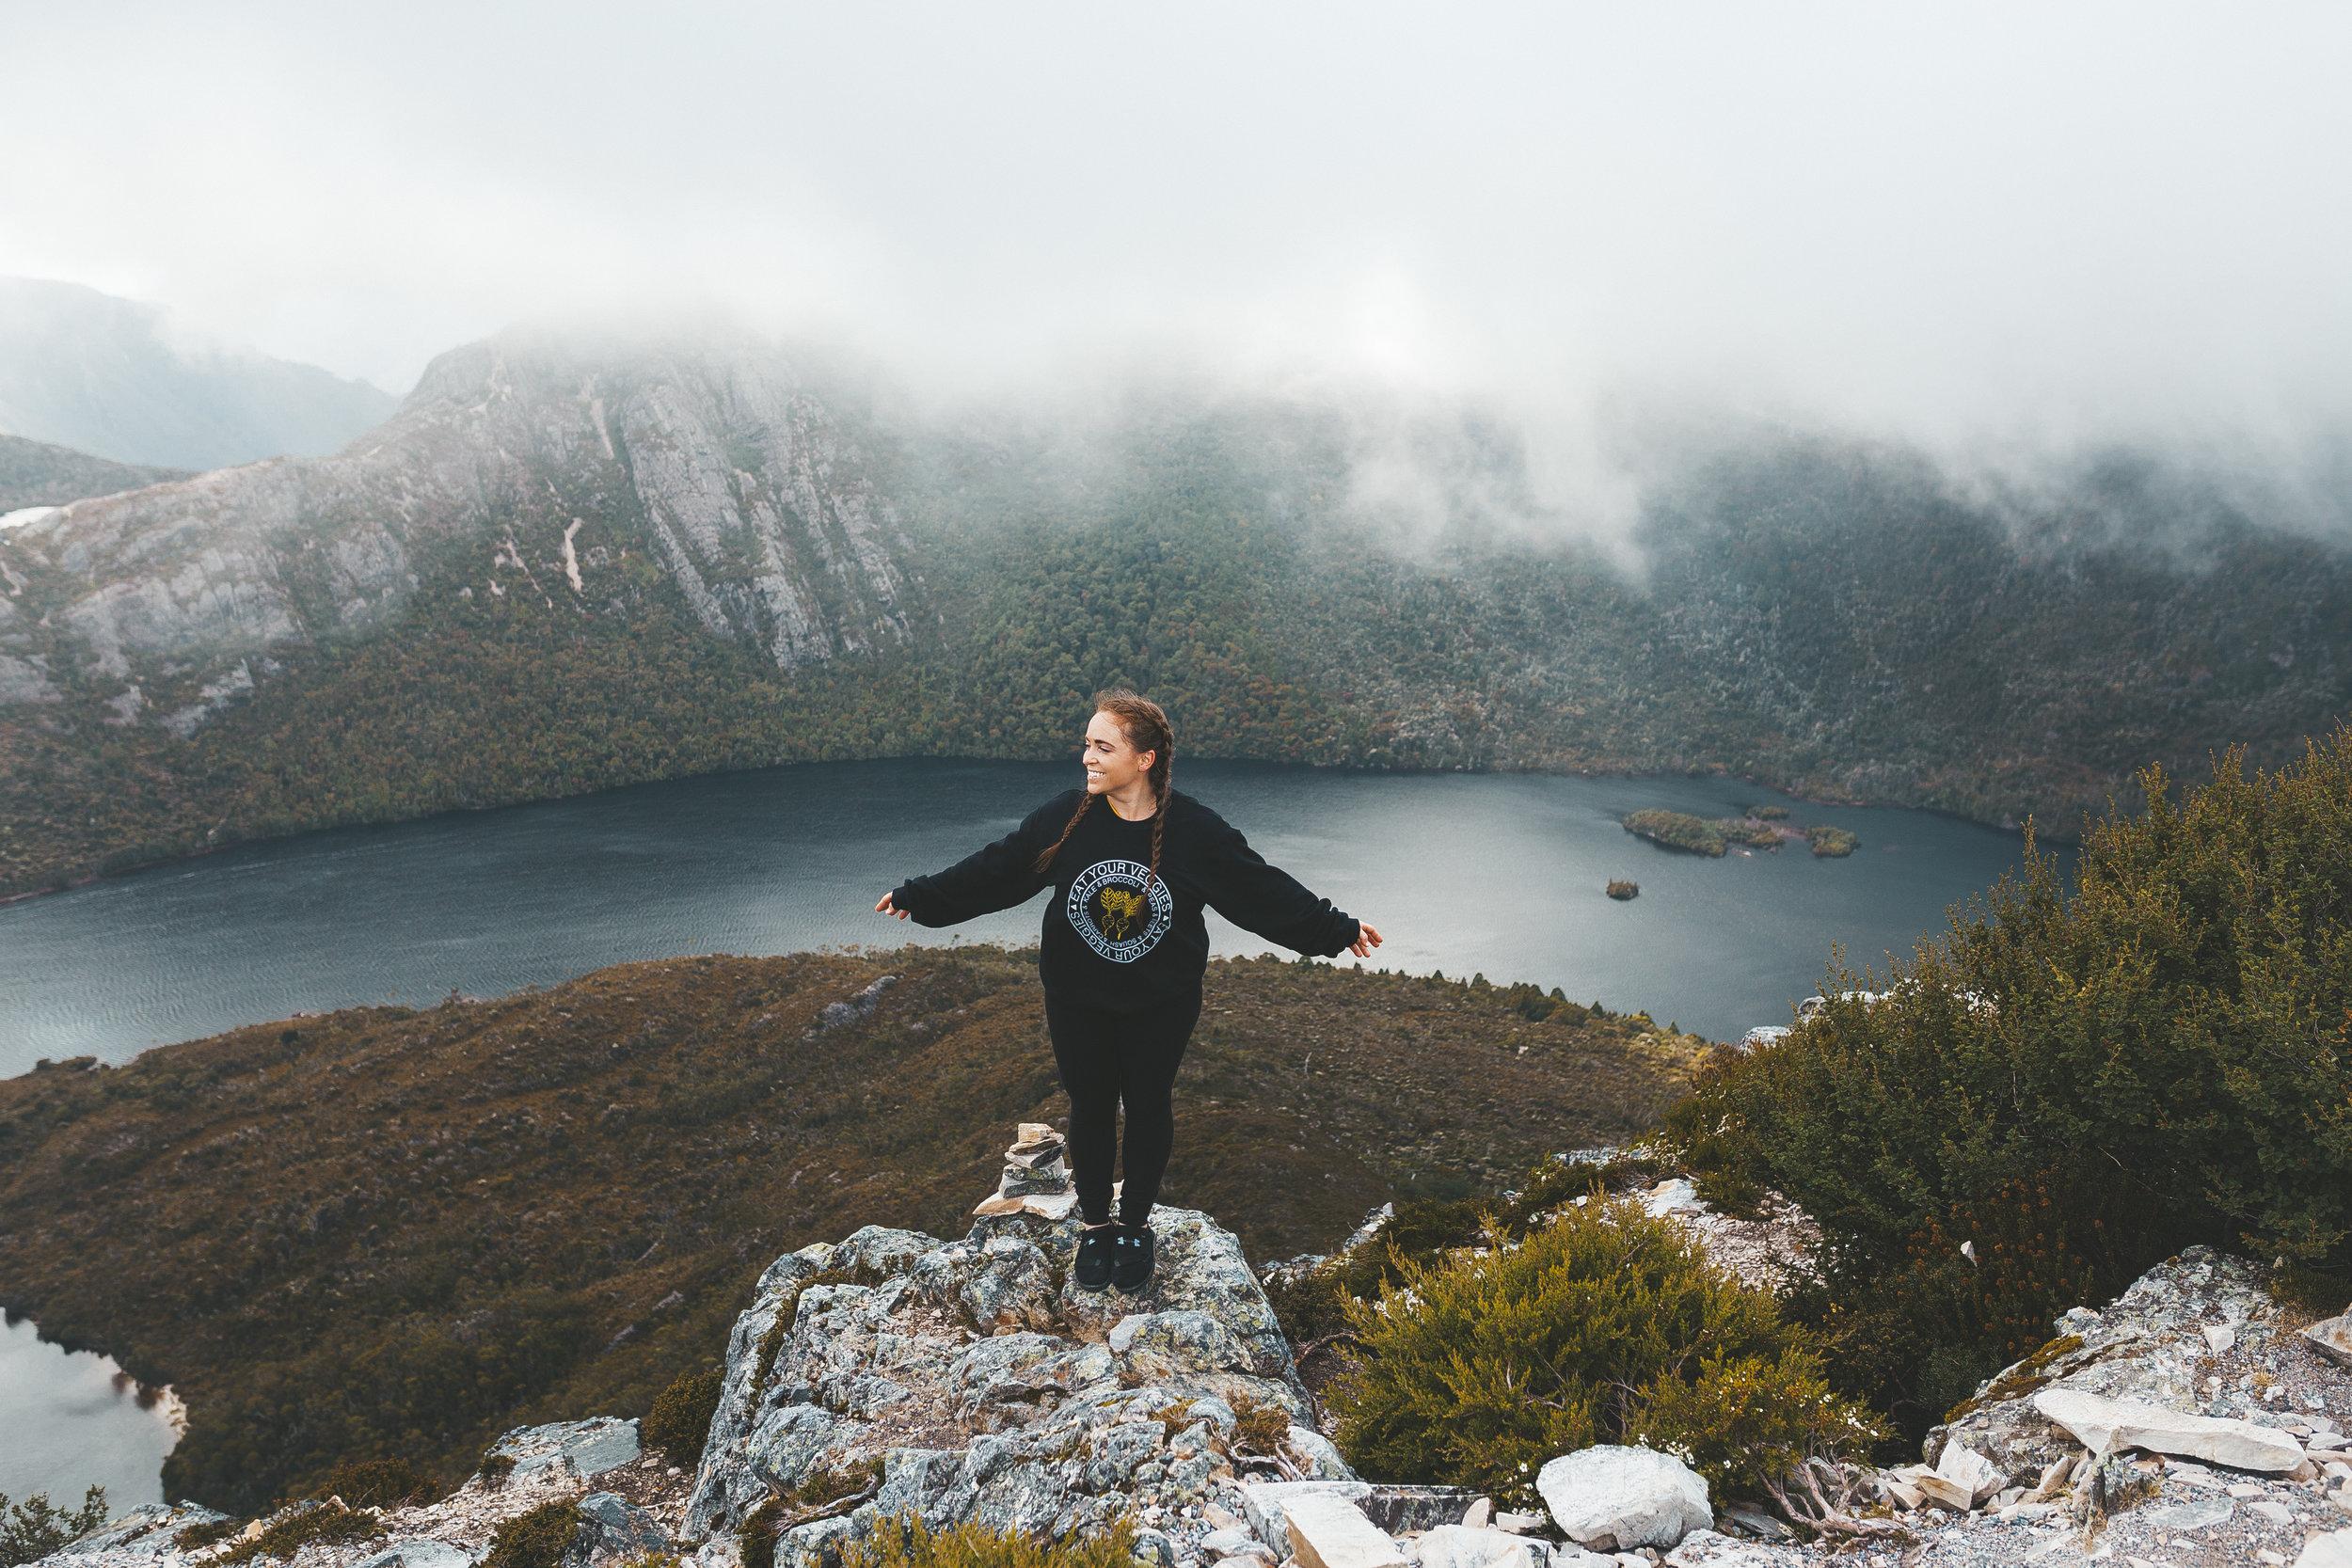 cradle mountain summit hike review tasmania-12.jpg